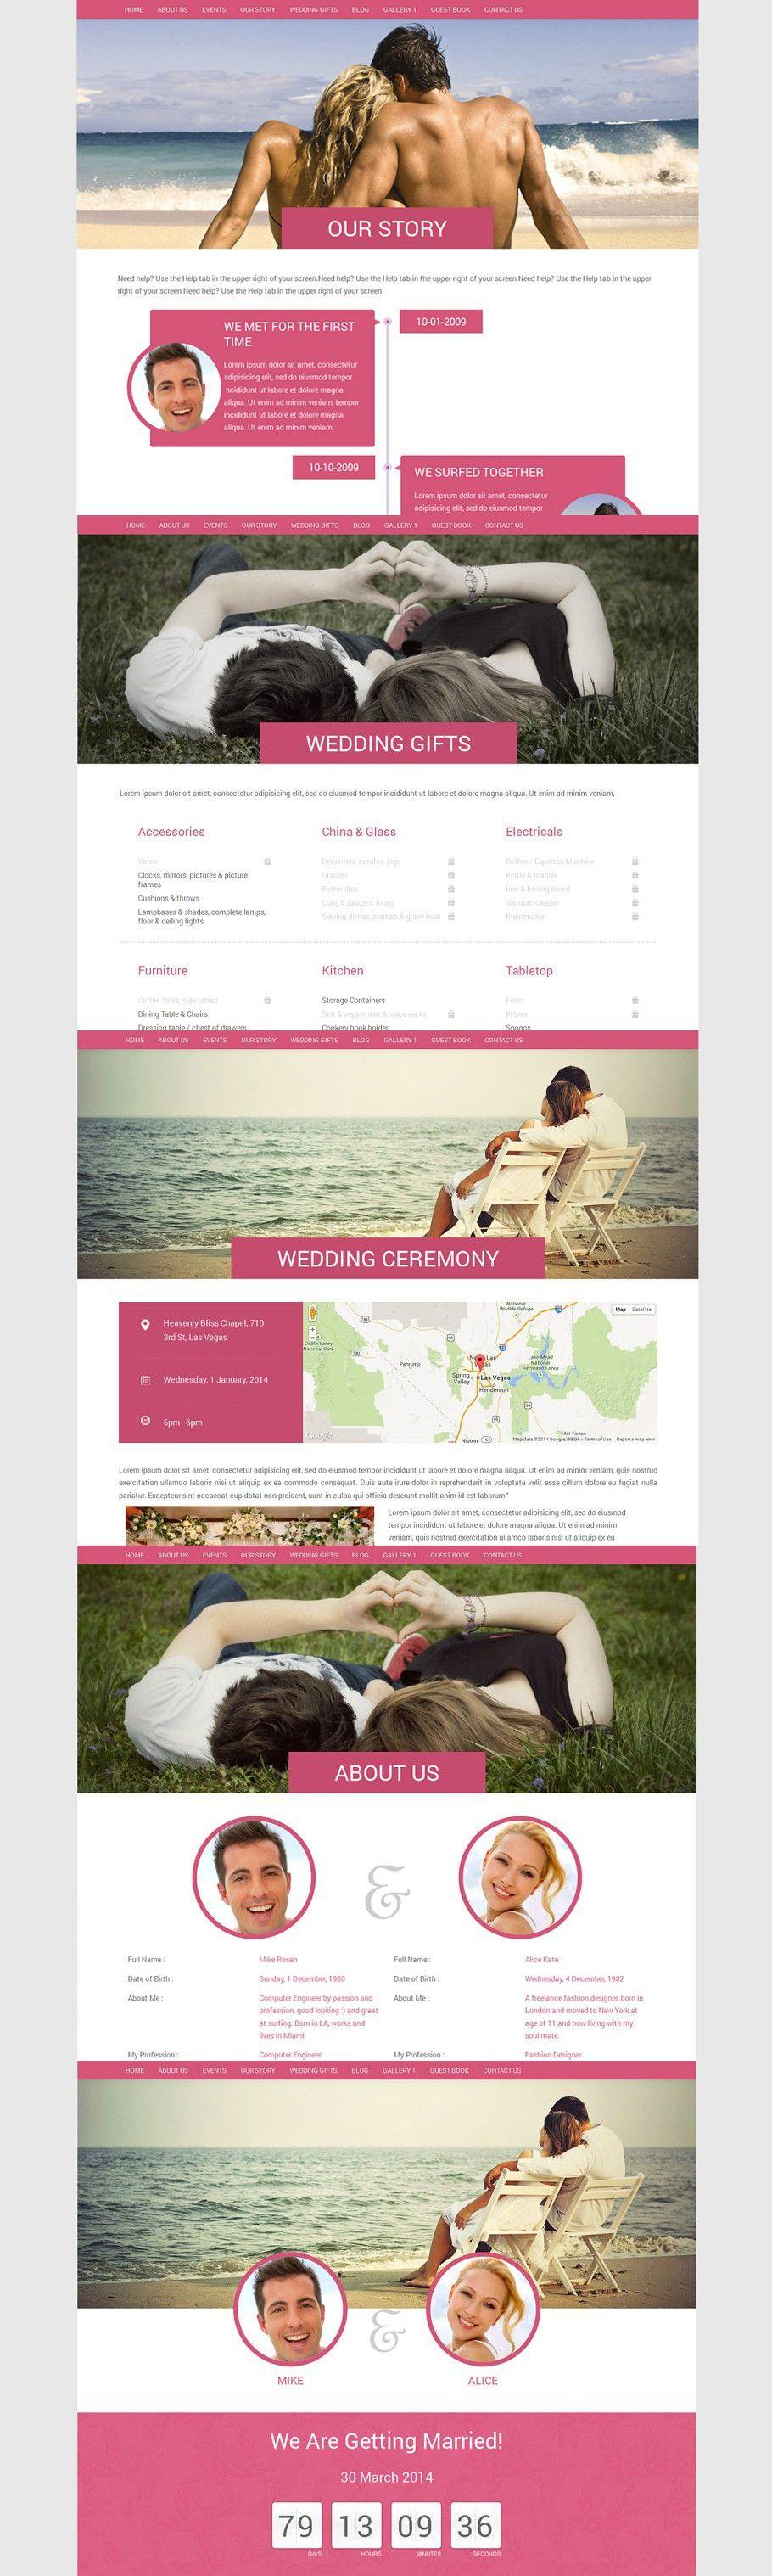 Wordpress Wedding Theme'Wedding' in 2020 Wedding